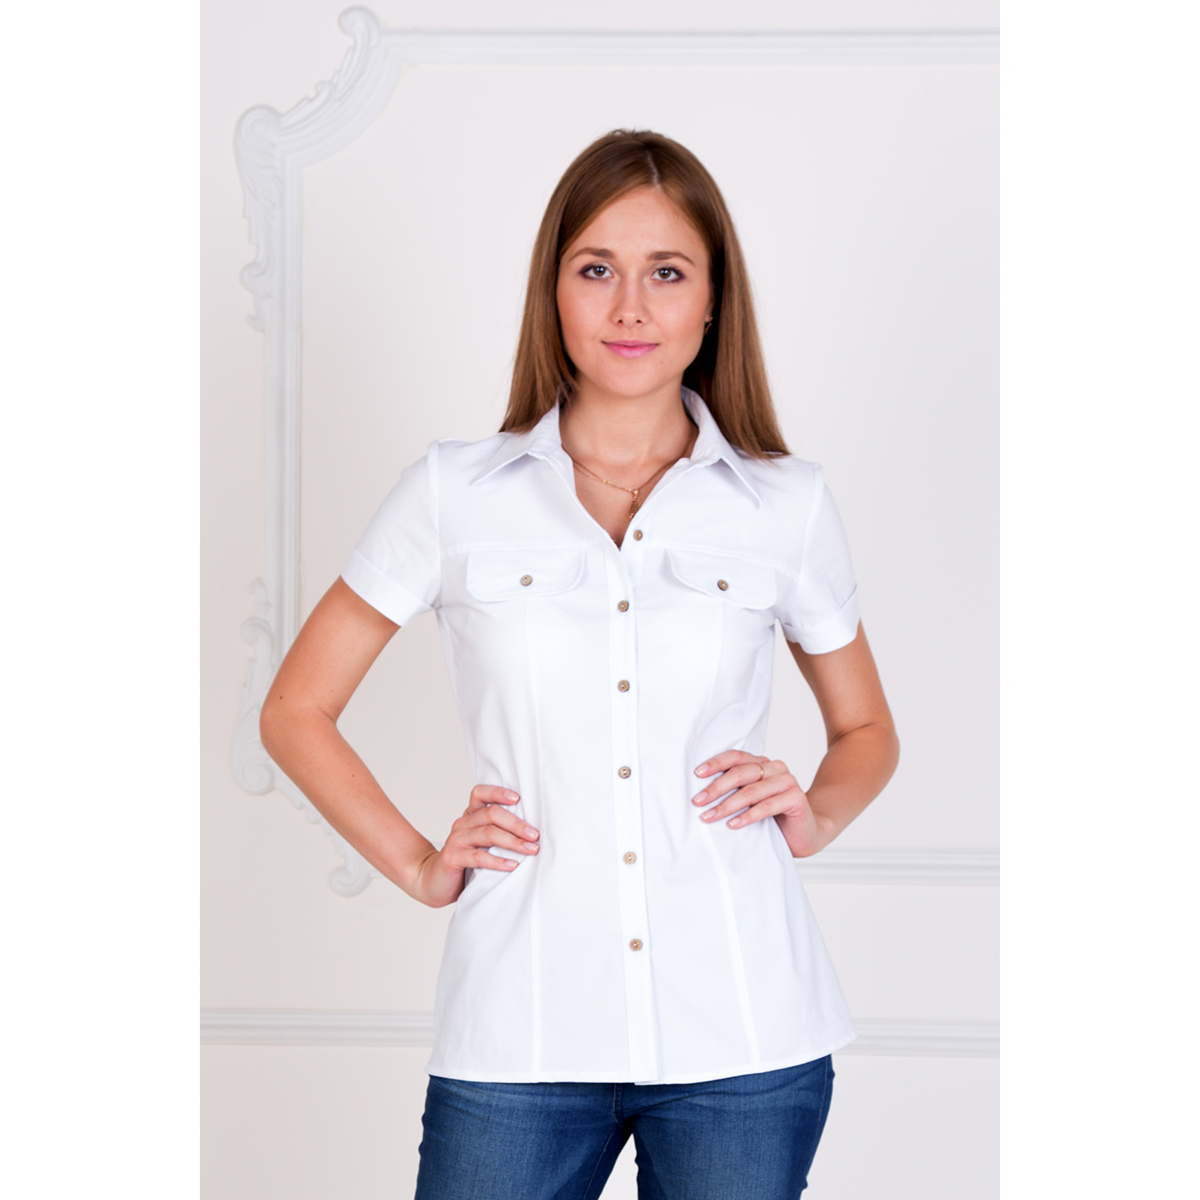 Женская рубашка Александра Белый, размер 44Рубашки<br>Обхват груди:88 см<br>Обхват талии:68 см<br>Обхват бедер:96 см<br>Рост:167 см<br><br>Тип: Жен. рубашка<br>Размер: 44<br>Материал: Хлопок